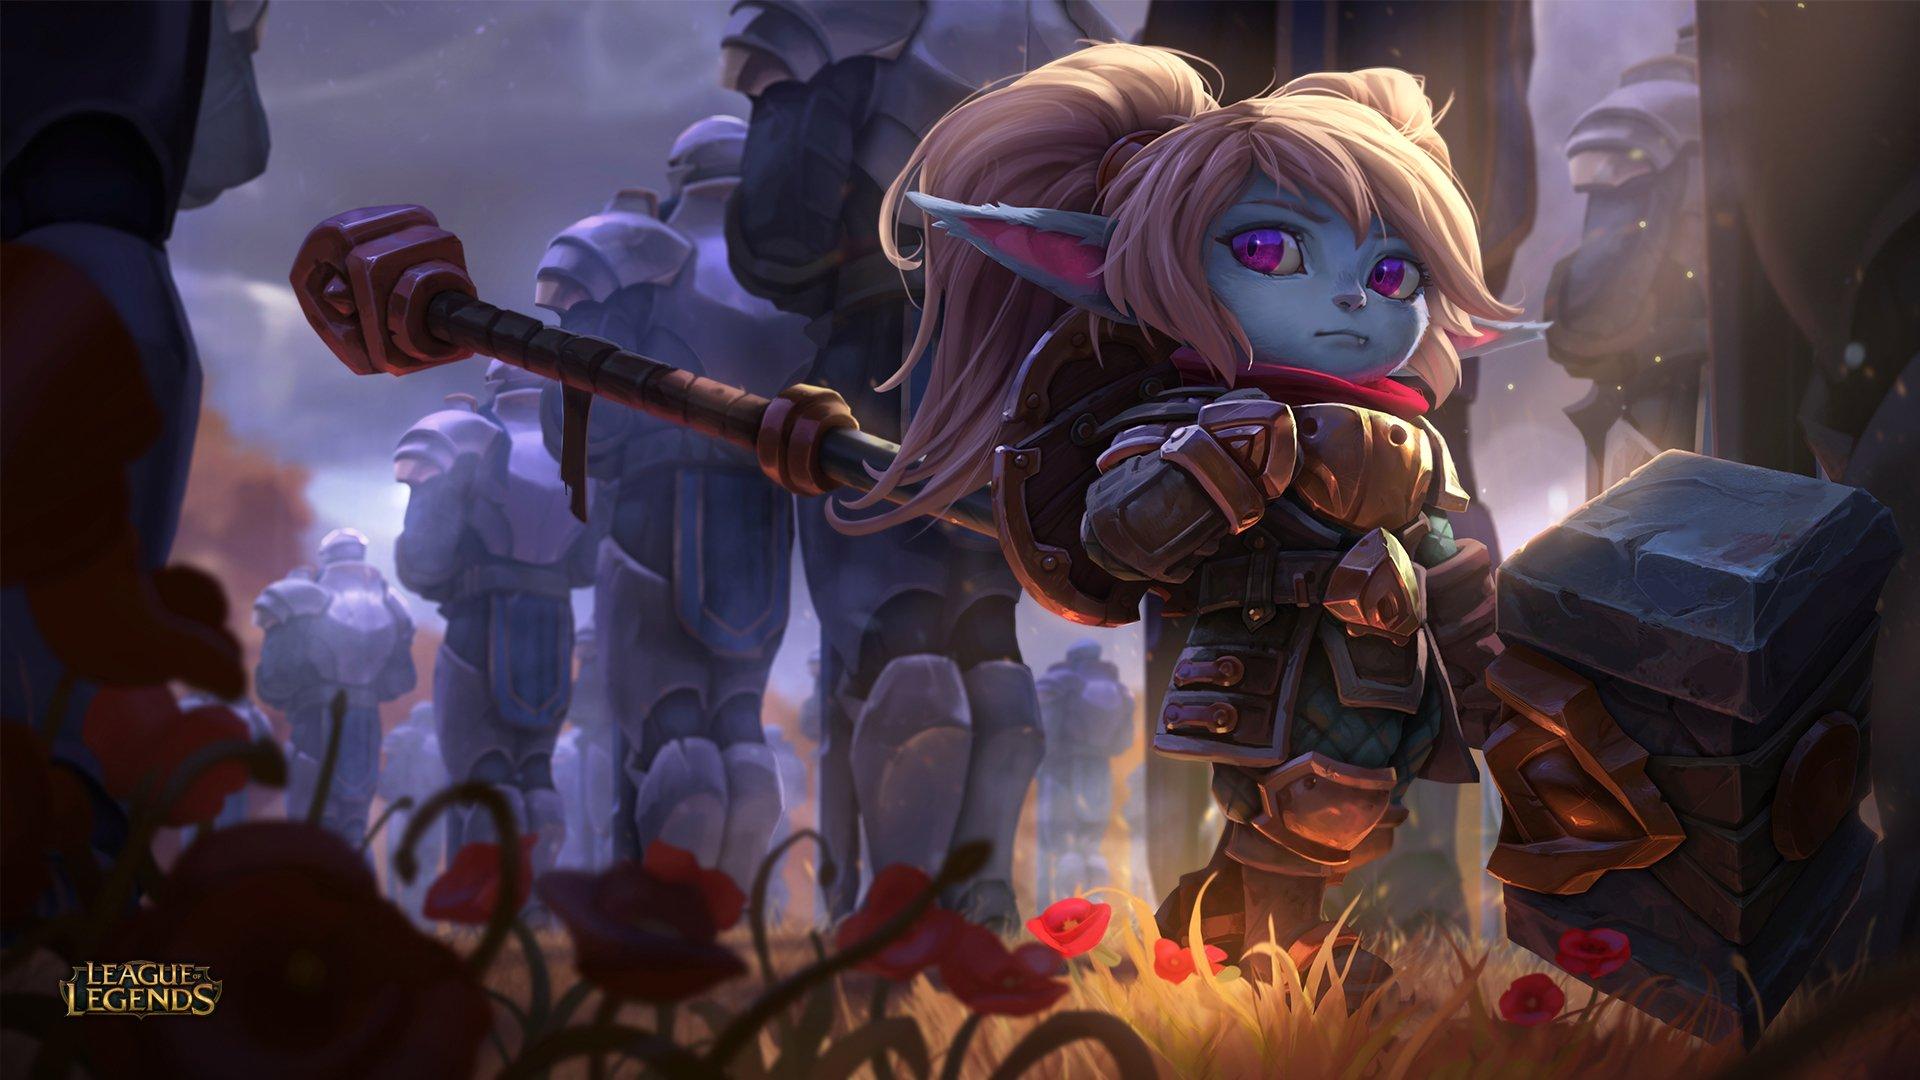 Download Poppy League Of Legends Wallpaper Hd Backgrounds